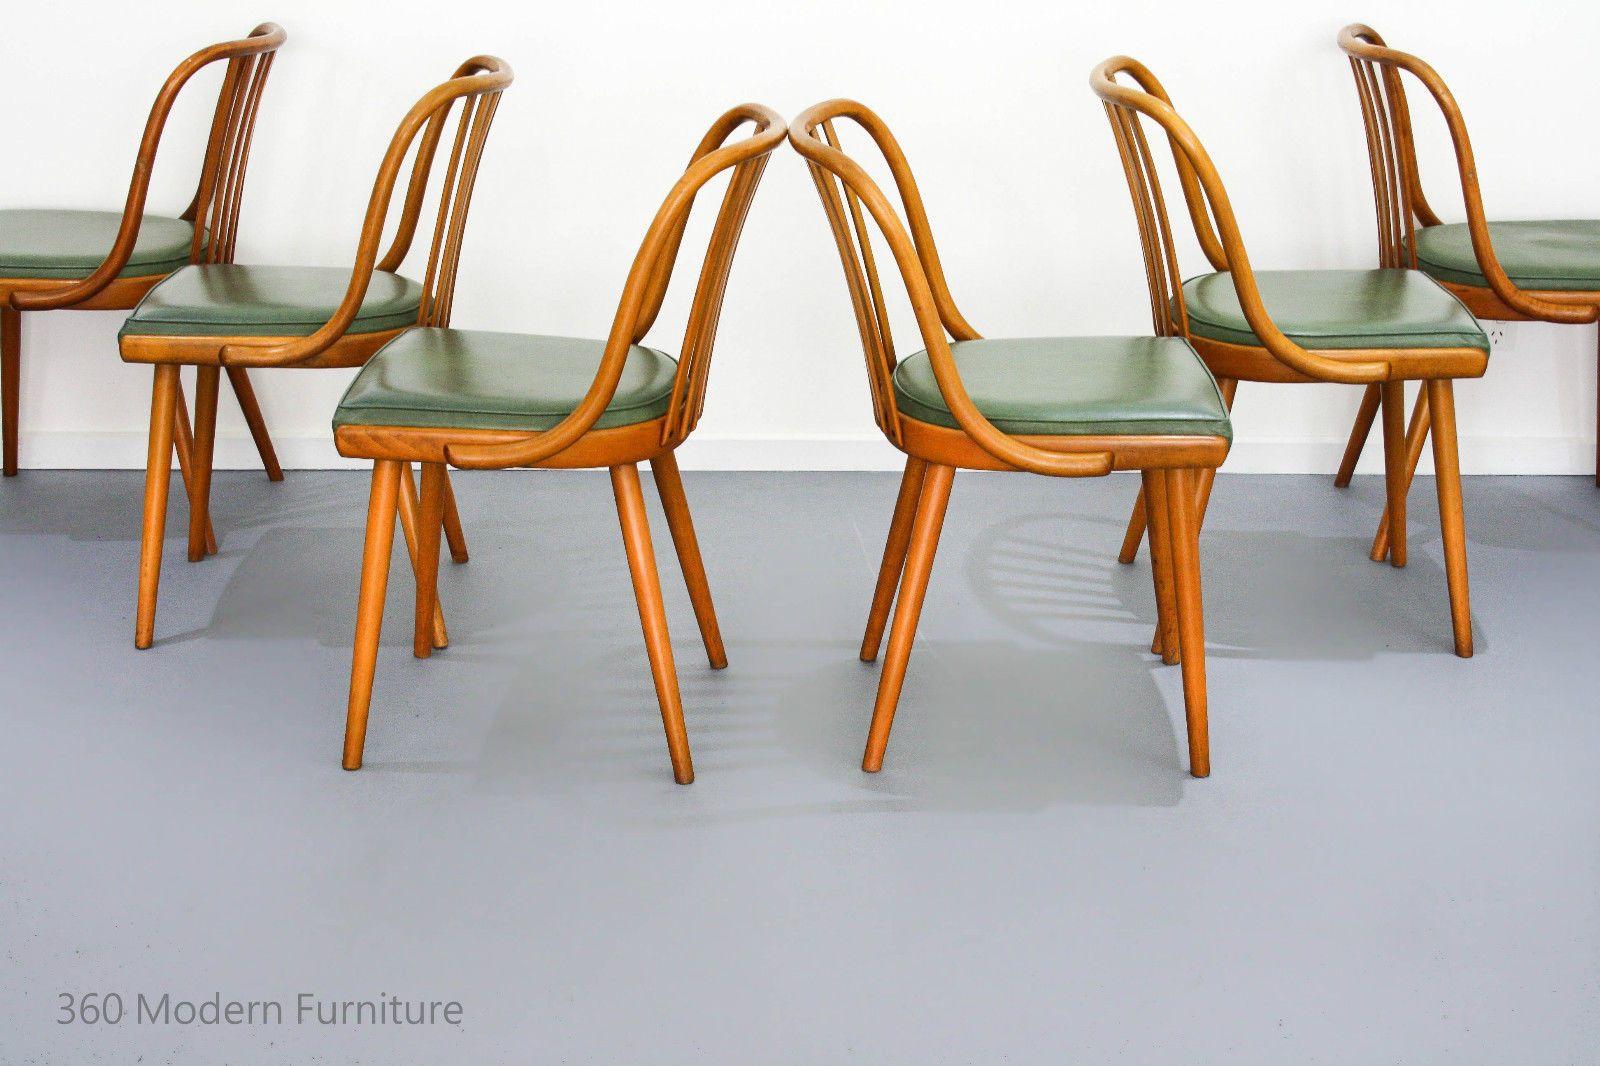 Original Bentwood Dining Chairs x 6 Ligna Vintage Retro Mid Century thonet  Czech in Home   Garden  Furniture  Dining Room Furniture. Original Bentwood Dining Chairs x 6 Ligna Vintage Retro Mid